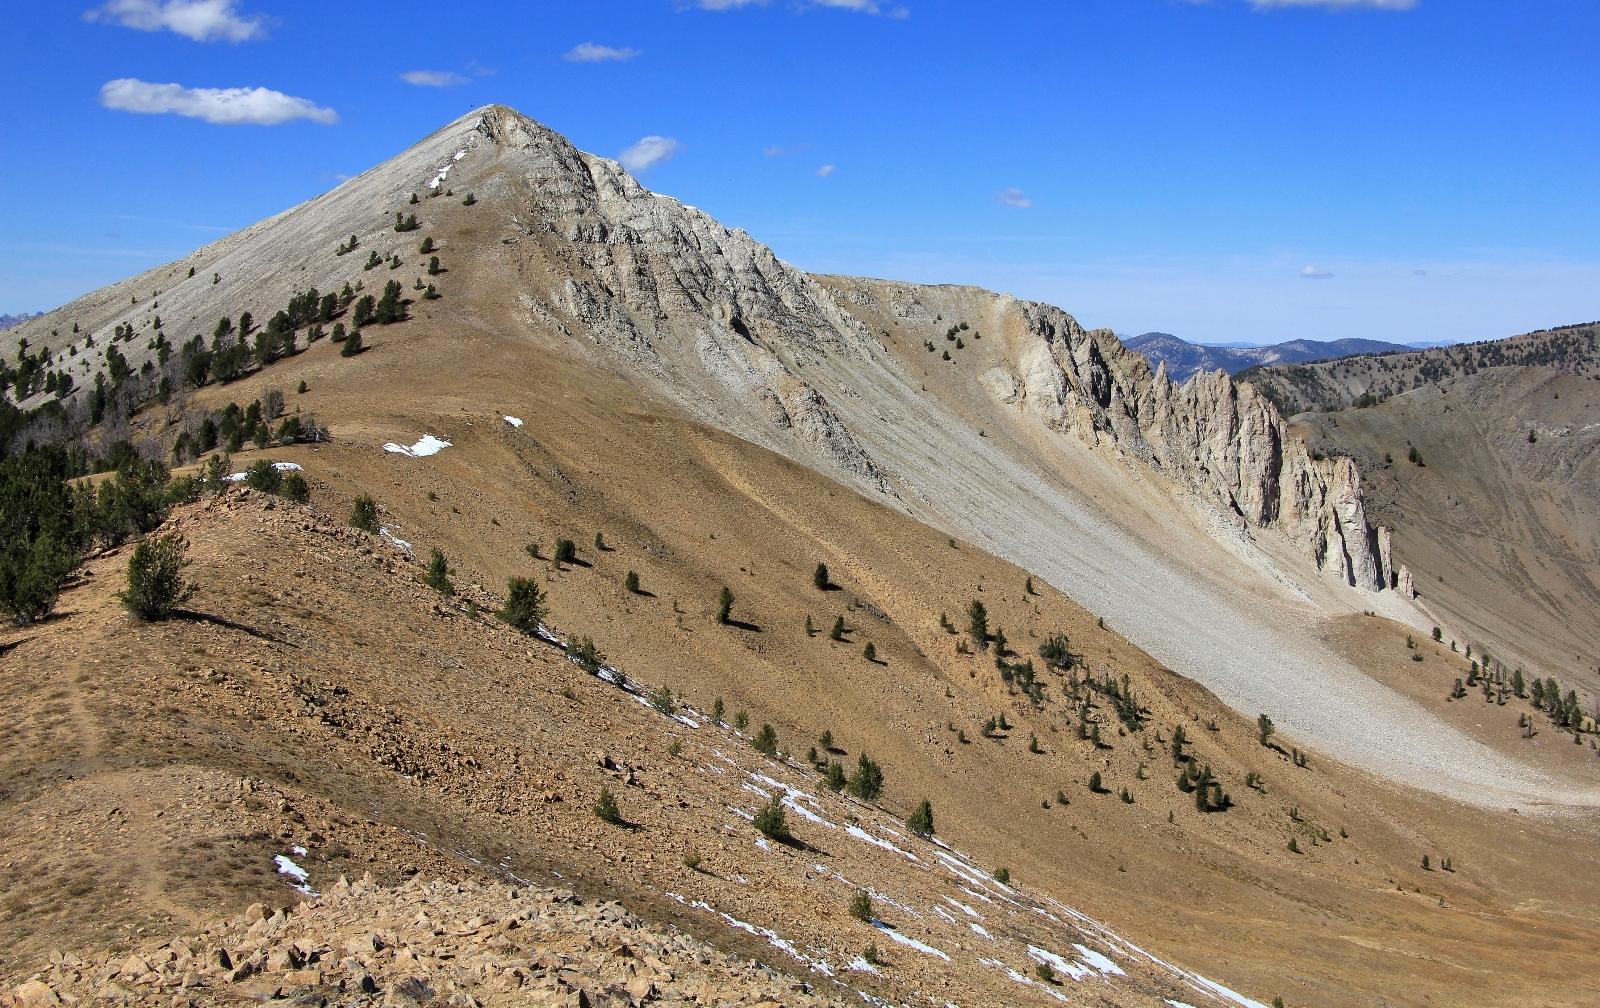 09-22-15 Born Lakes ridgeline hike (123)